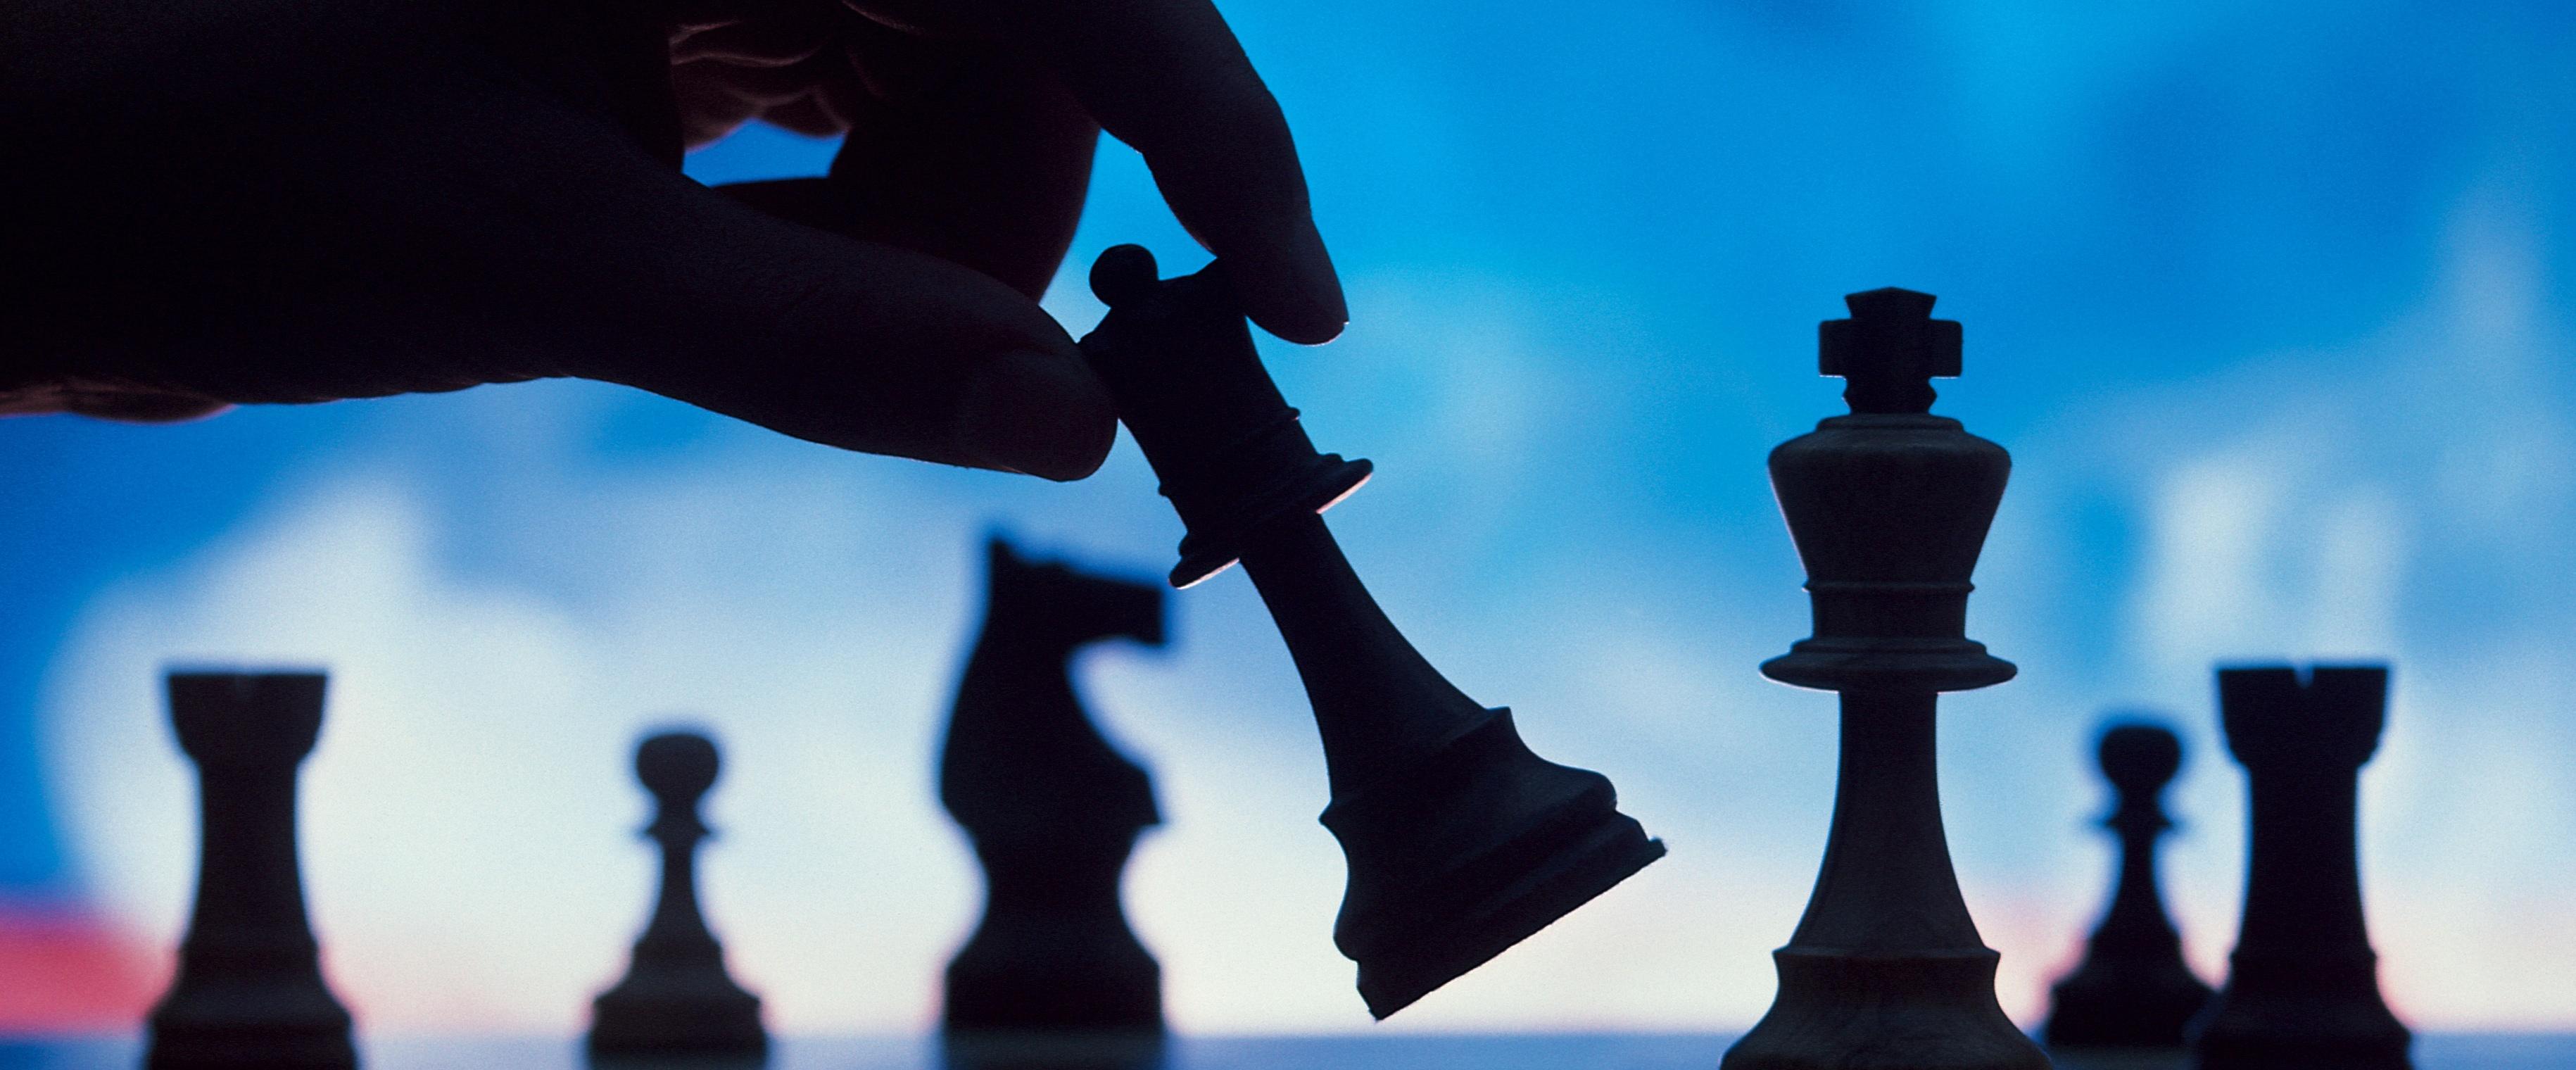 strategystockphoto.jpg